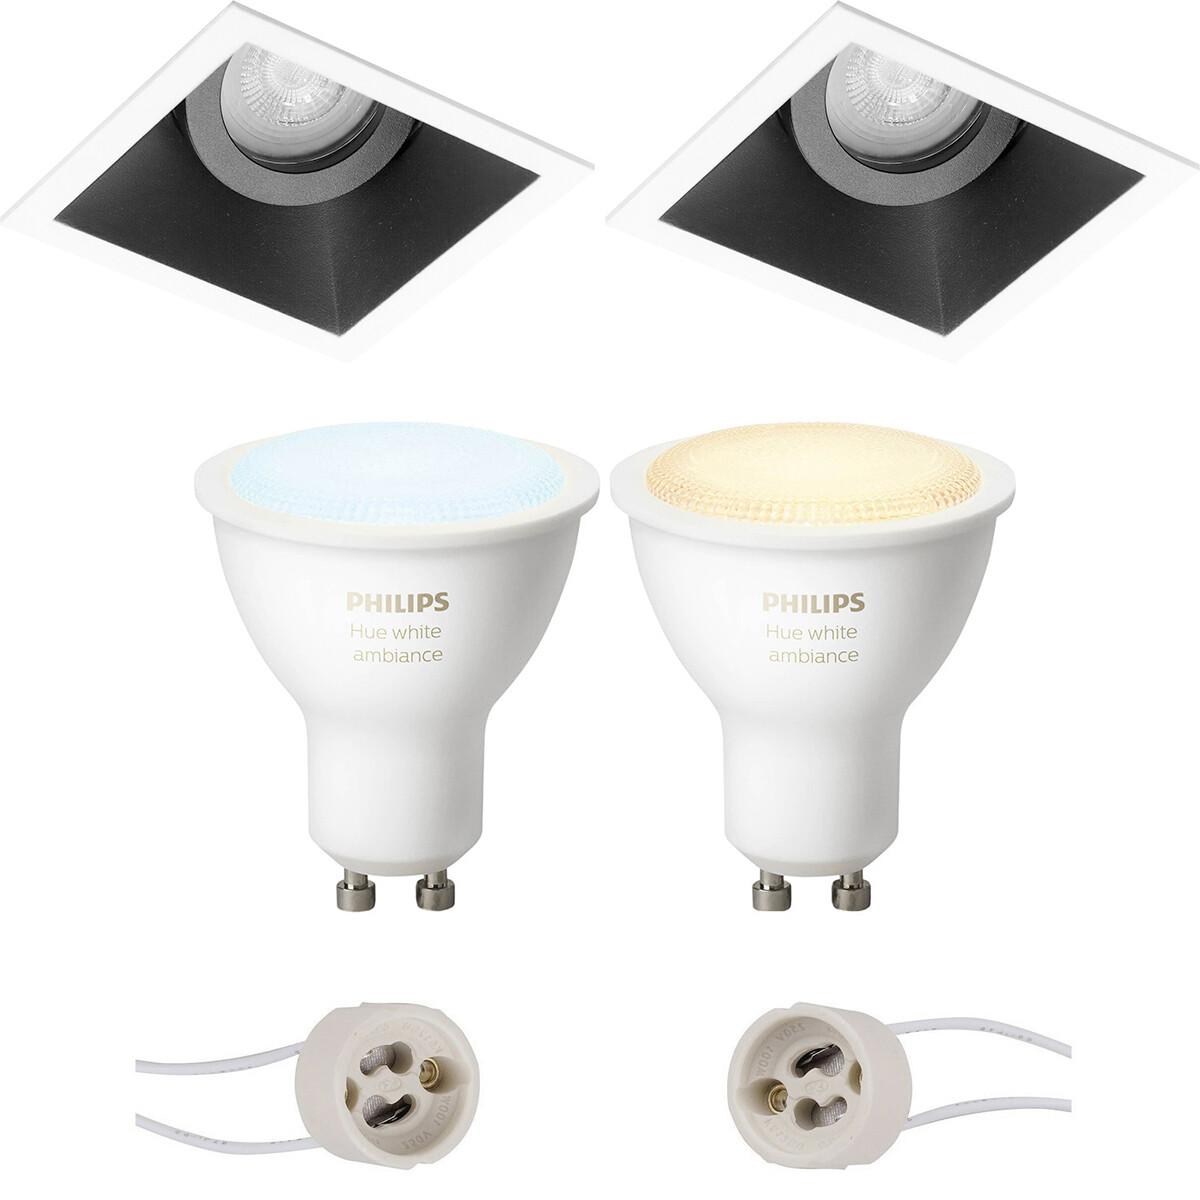 Pragmi Zano Pro - Inbouw Vierkant - Mat Zwart/Wit - Kantelbaar - 93mm - Philips Hue - LED Spot Set G